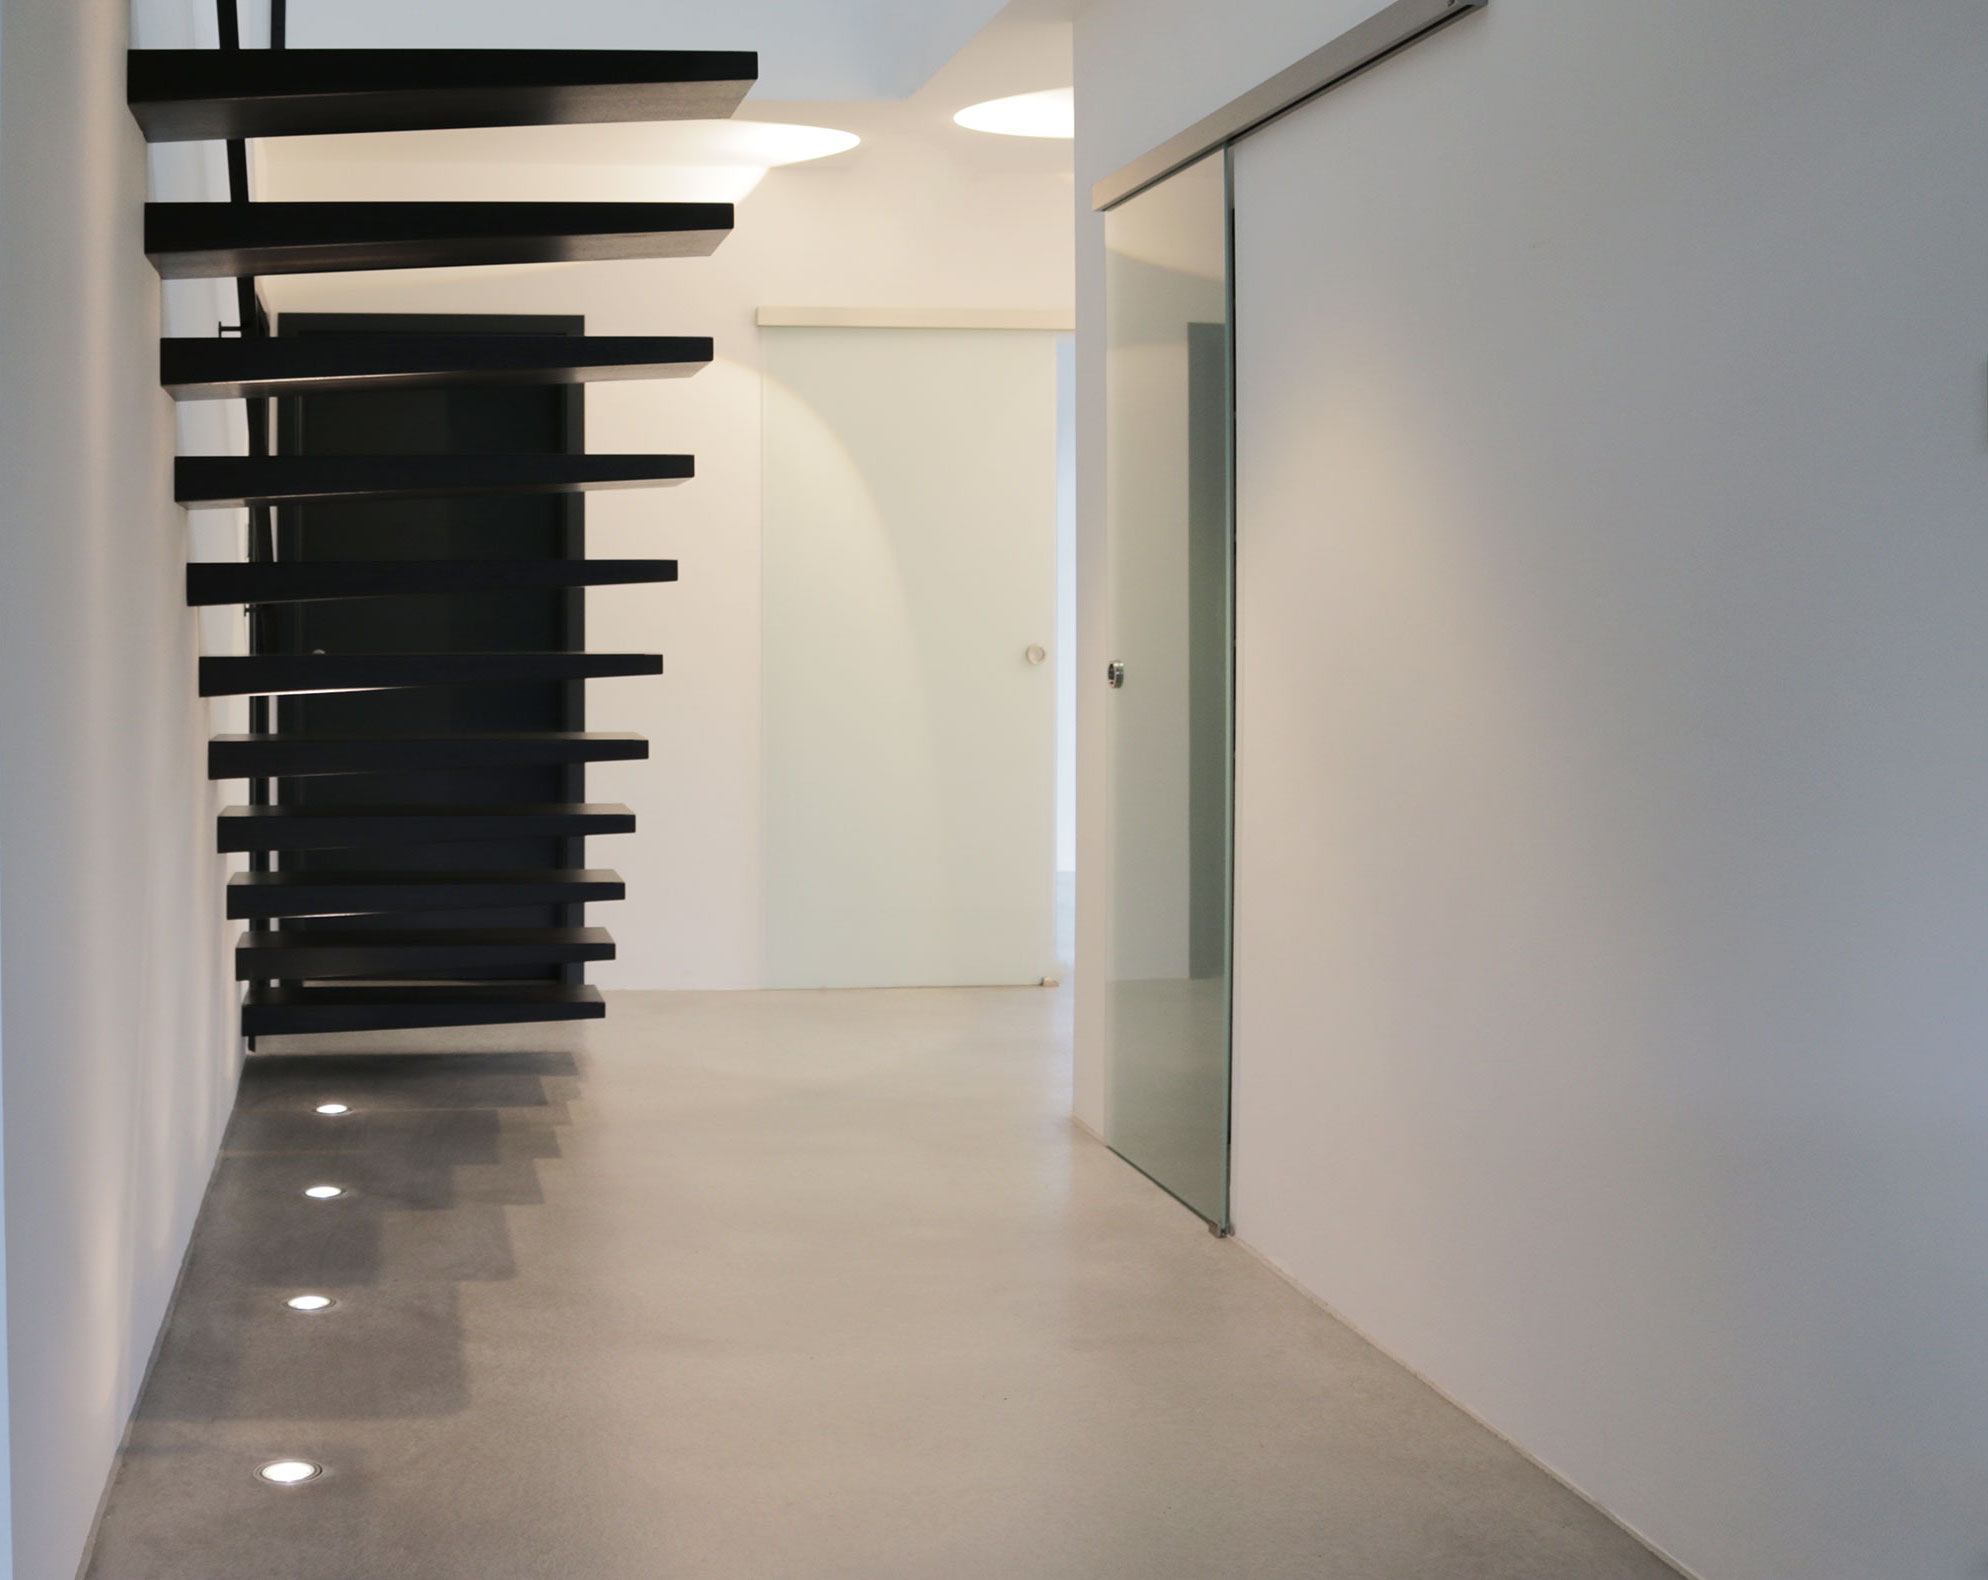 Beleuchtung Treppenaufgang mehr licht innovative beleuchtungskonzepte erobern treppen